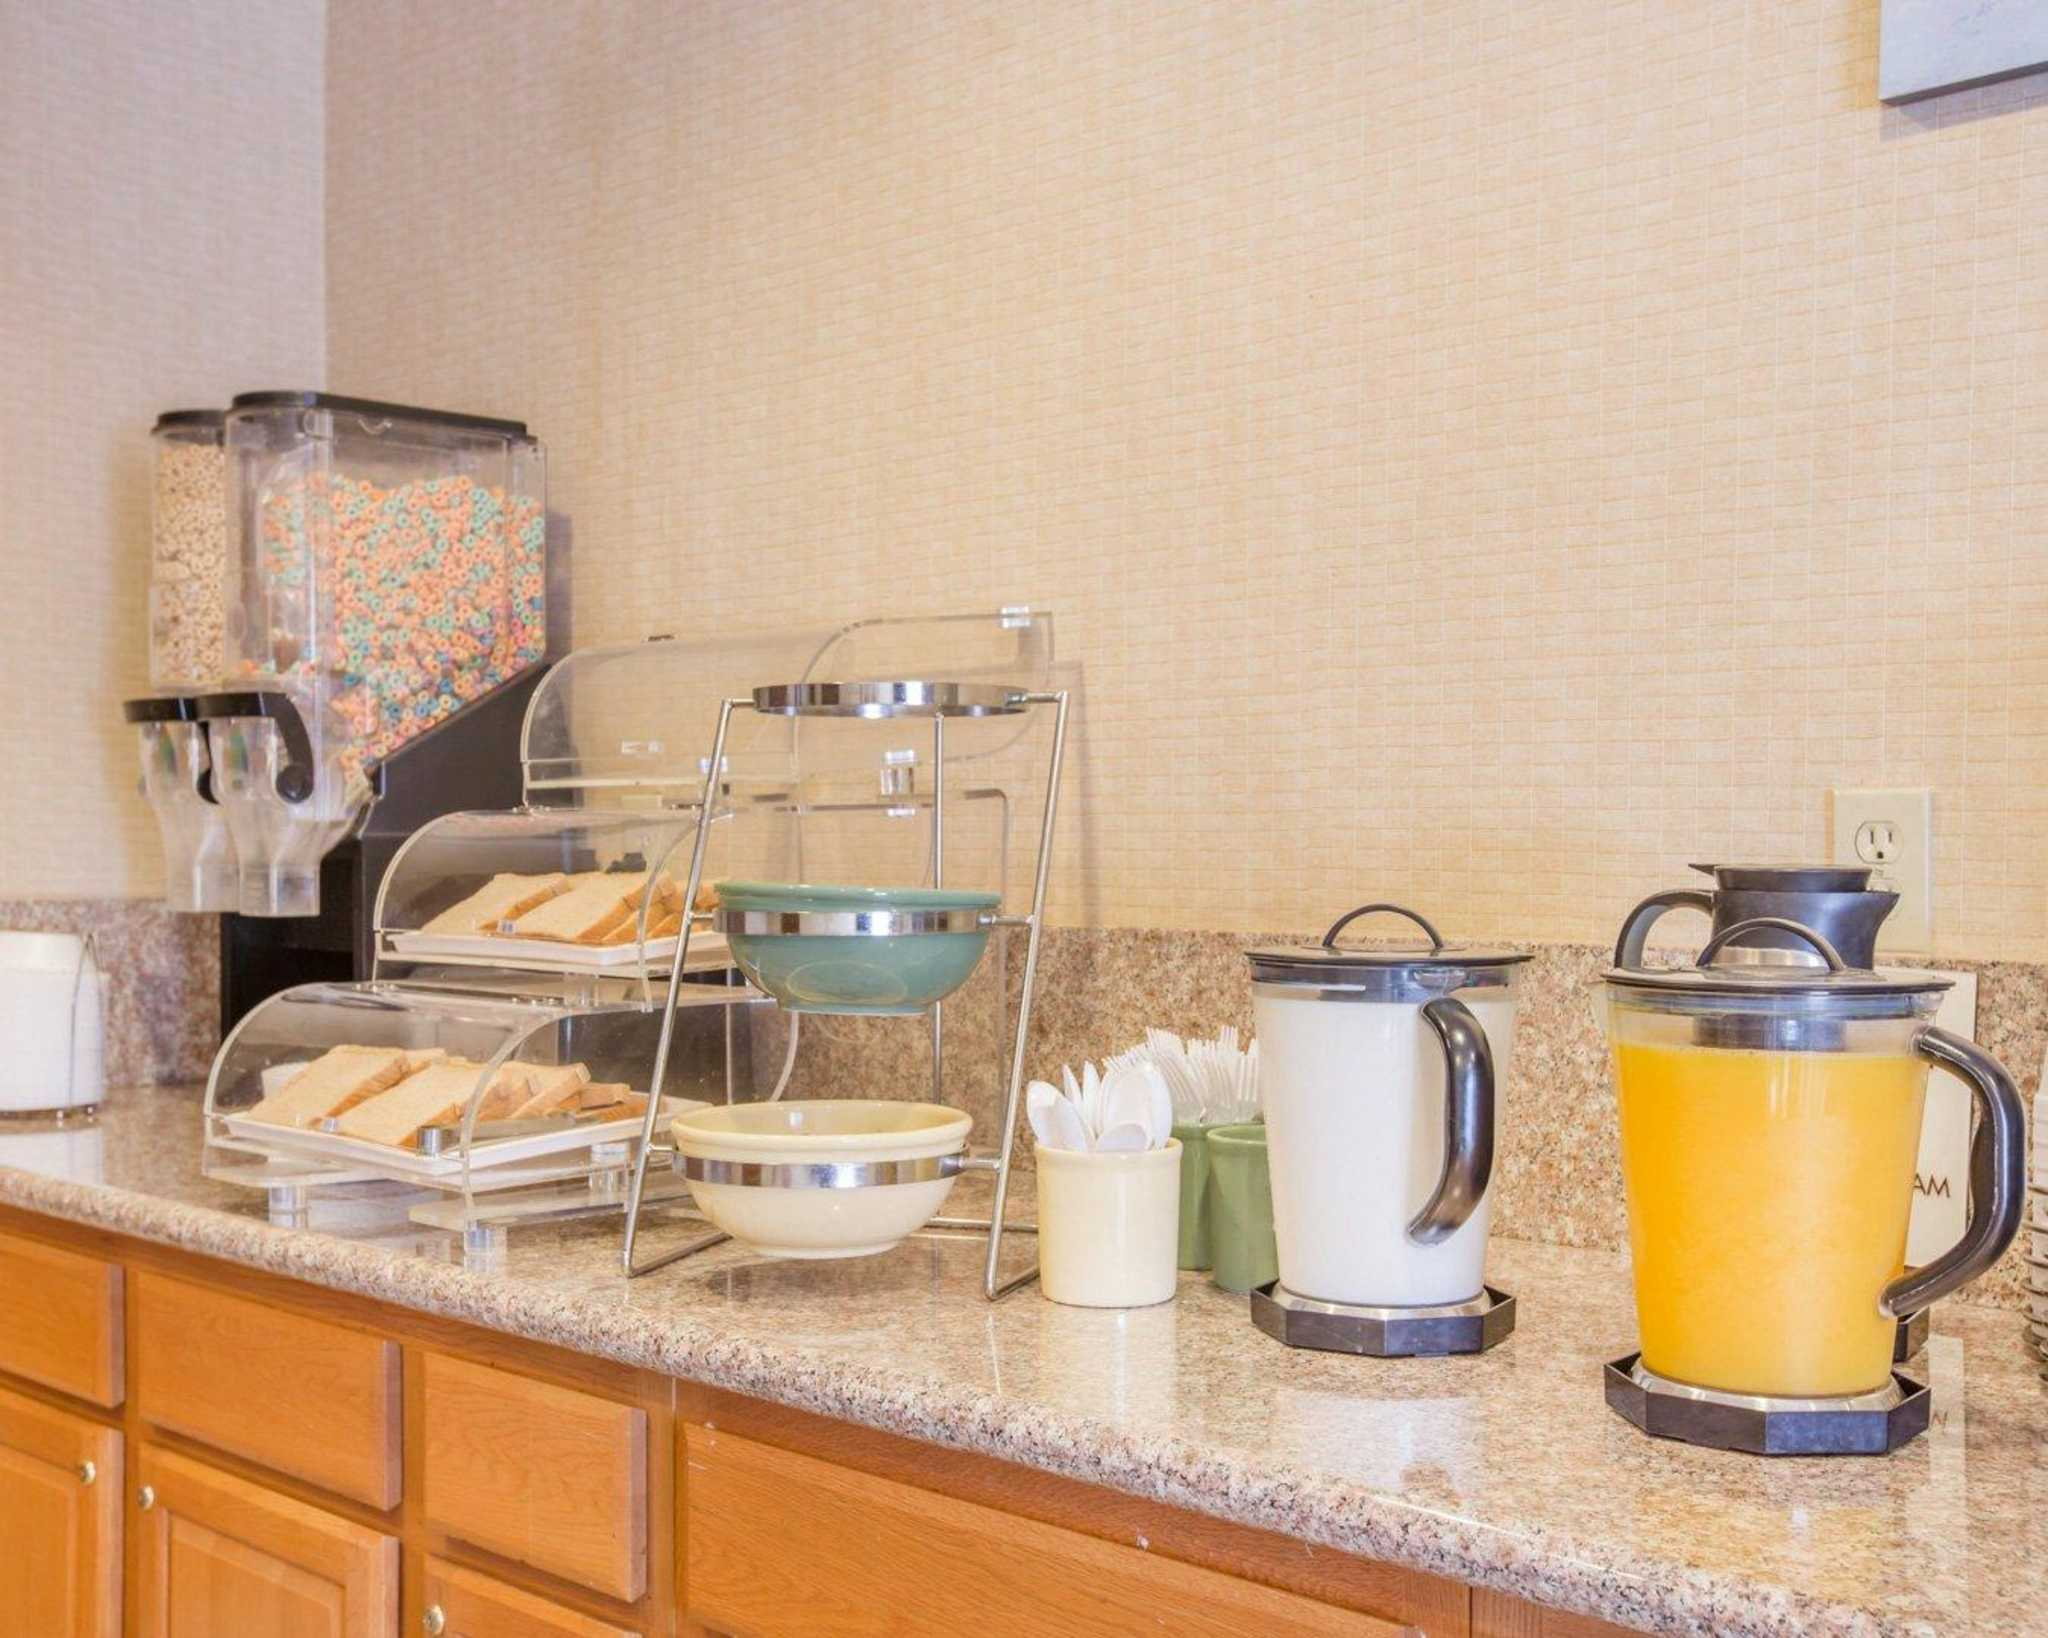 Econo Lodge Inn & Suites Lodi image 11